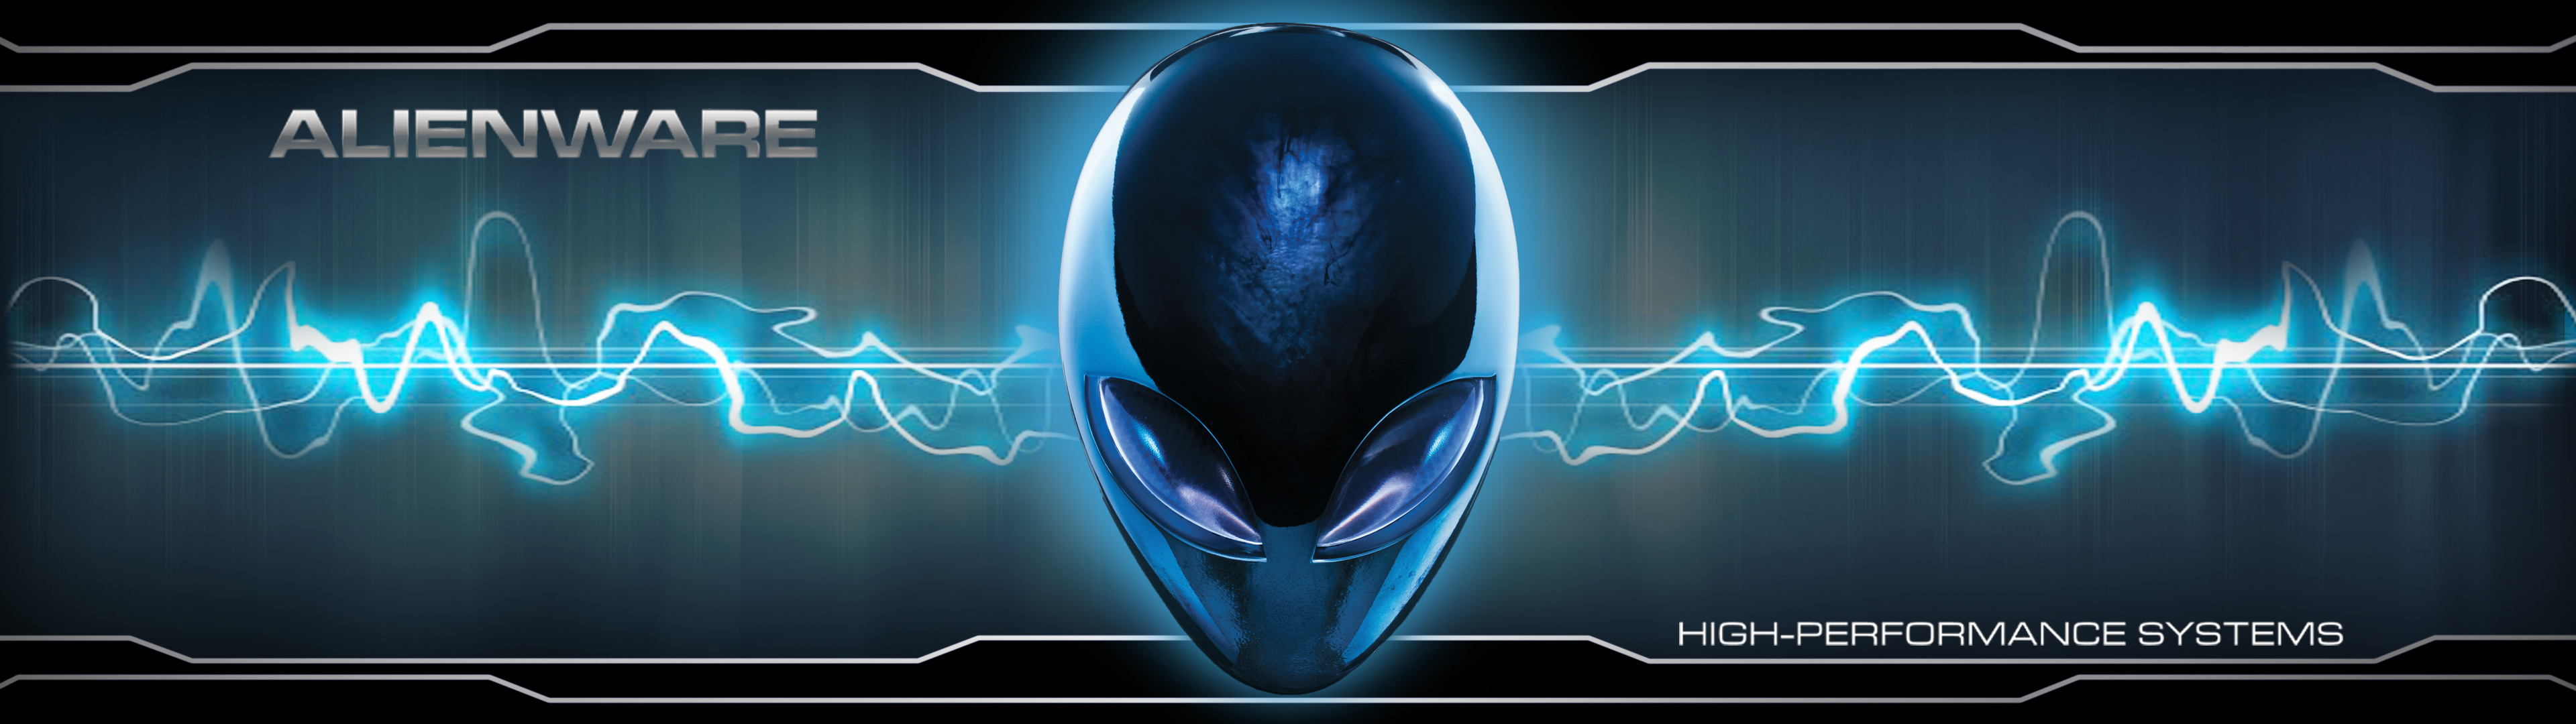 Alienware Rank5 Dual Monitor 2 by Rank5 on DeviantArt